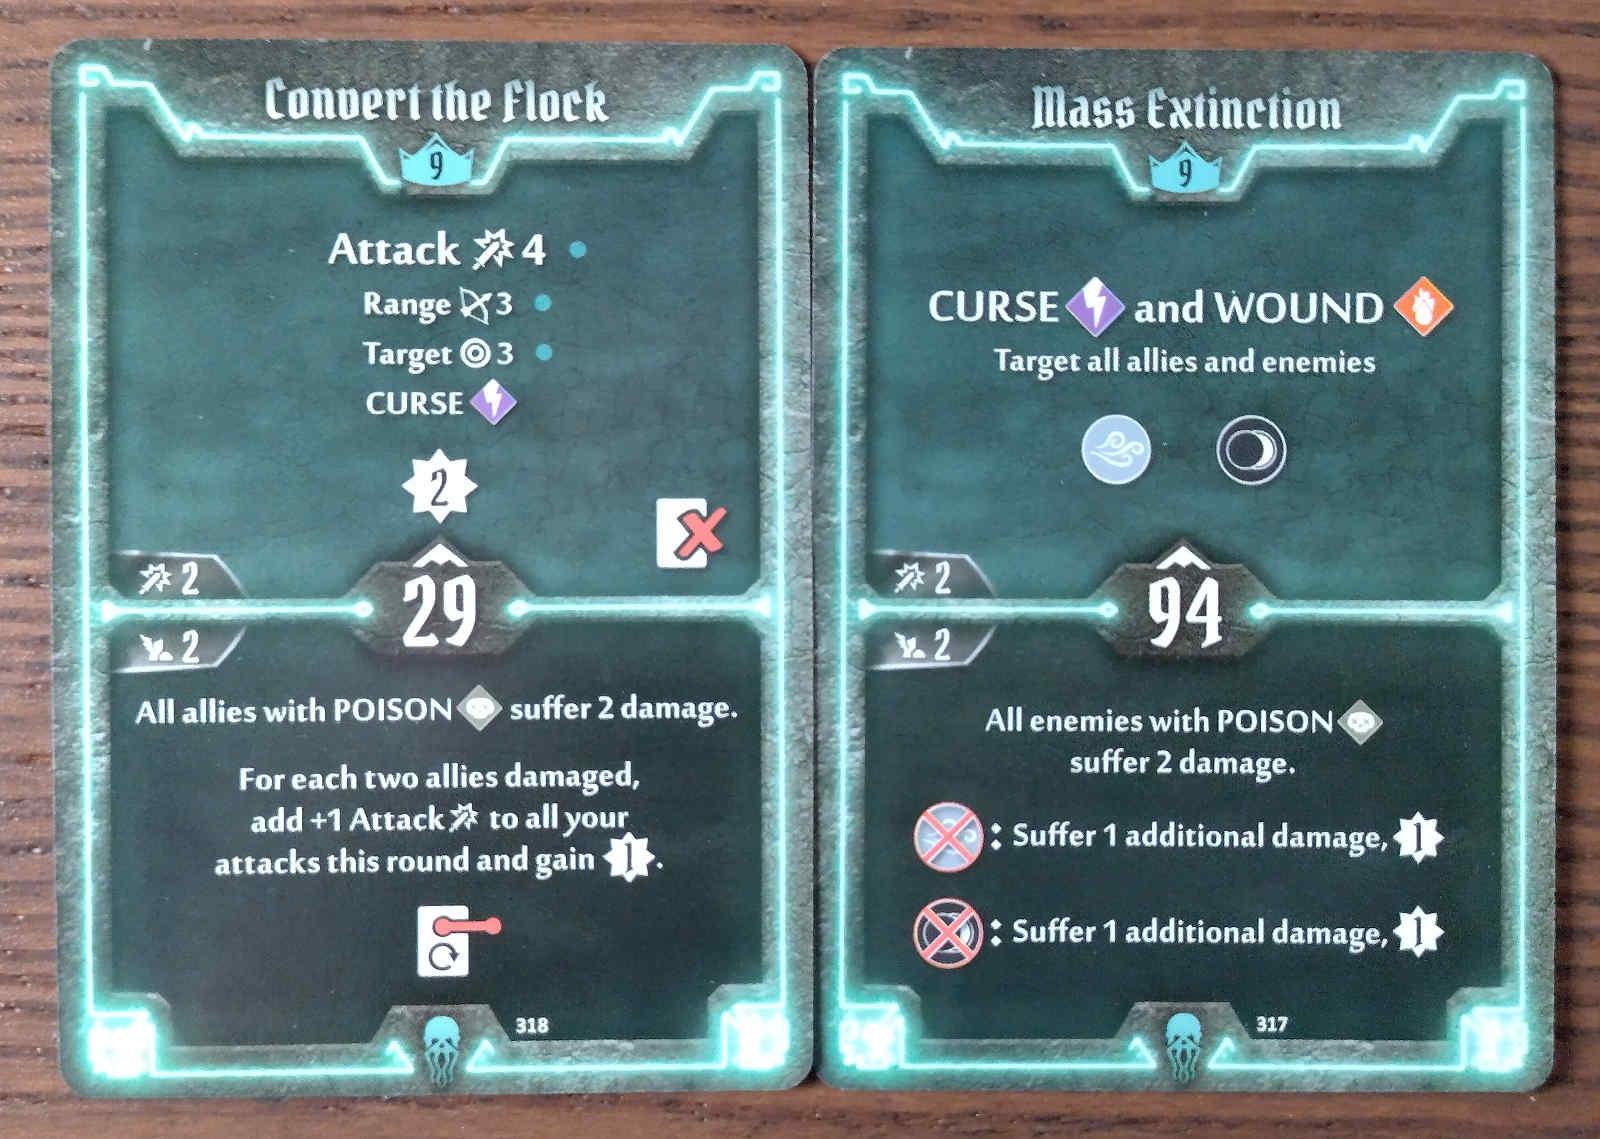 Level 9 Plagueherald cards - Convert the Flock and Mass Extinction